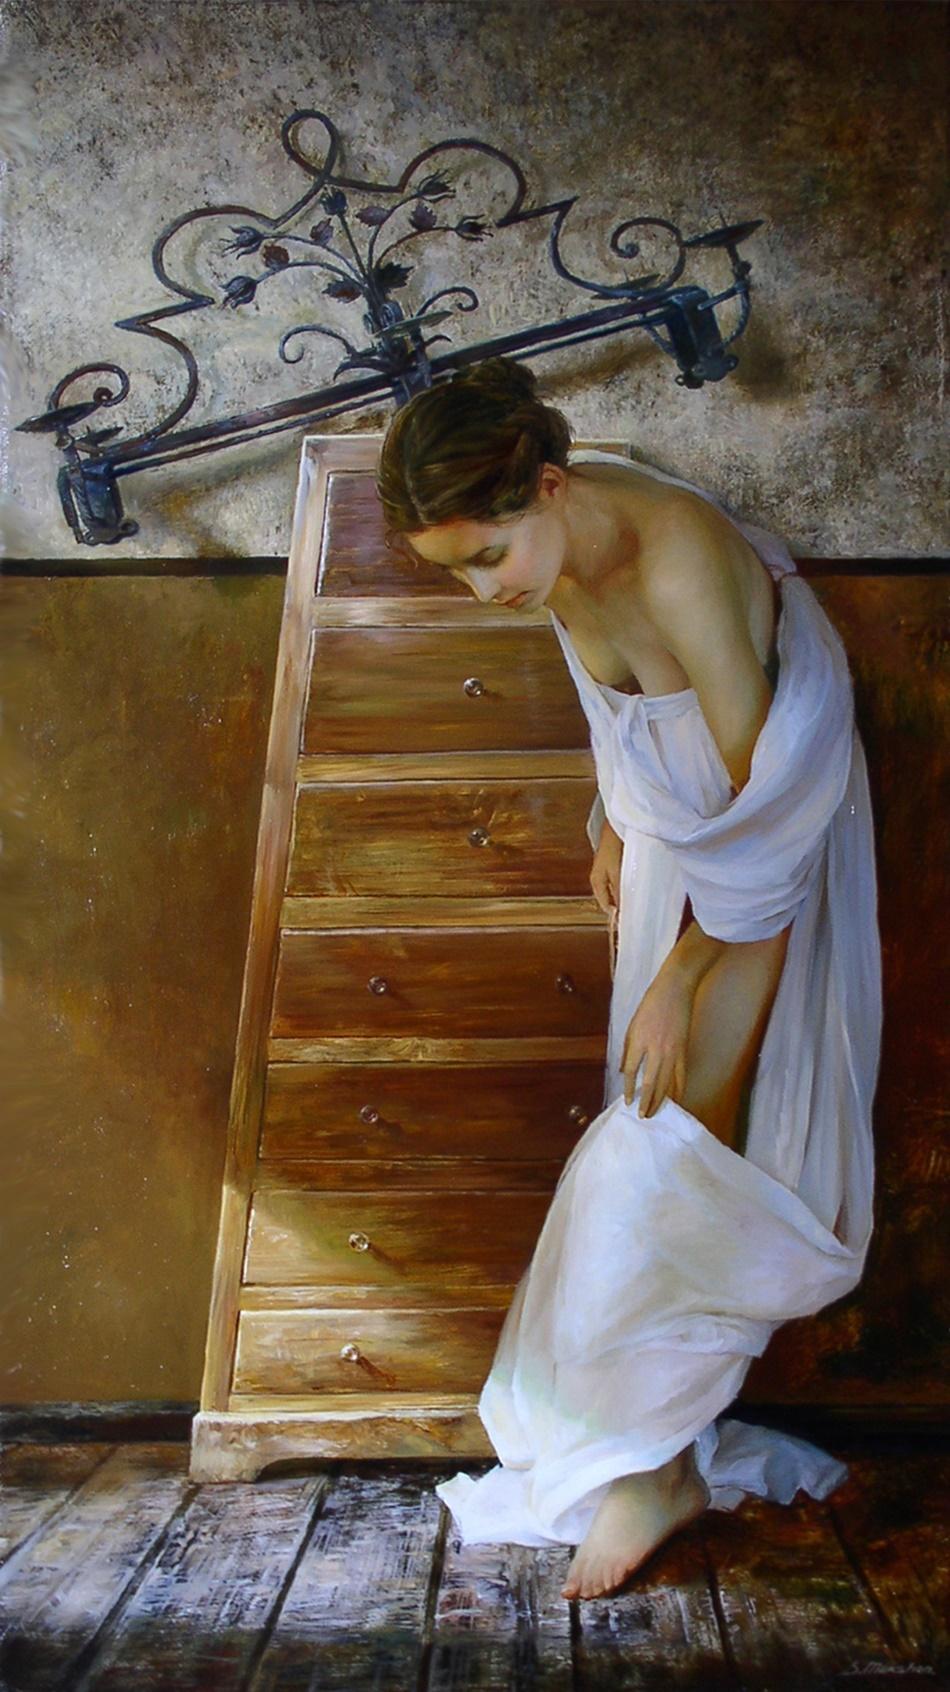 Women's images by a Russian realist artist Sergey Marshennikov - 02